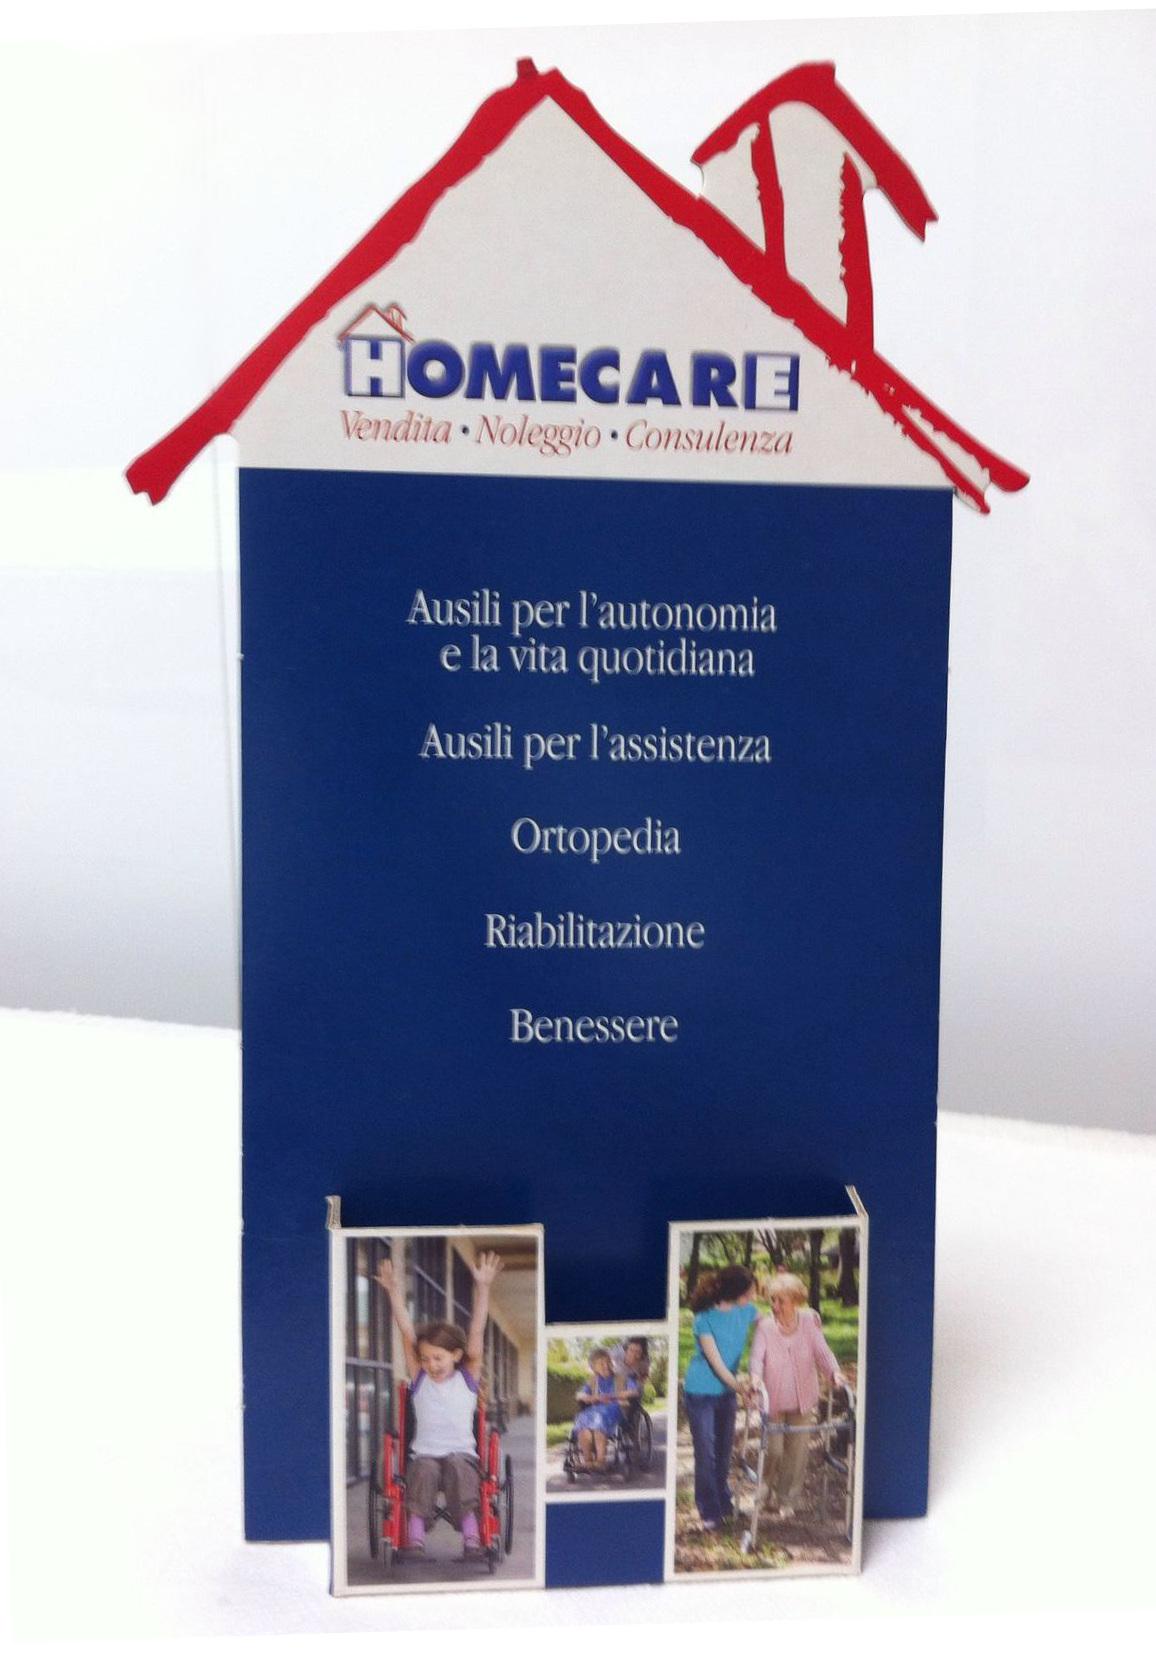 homecare-farmacie-treviso